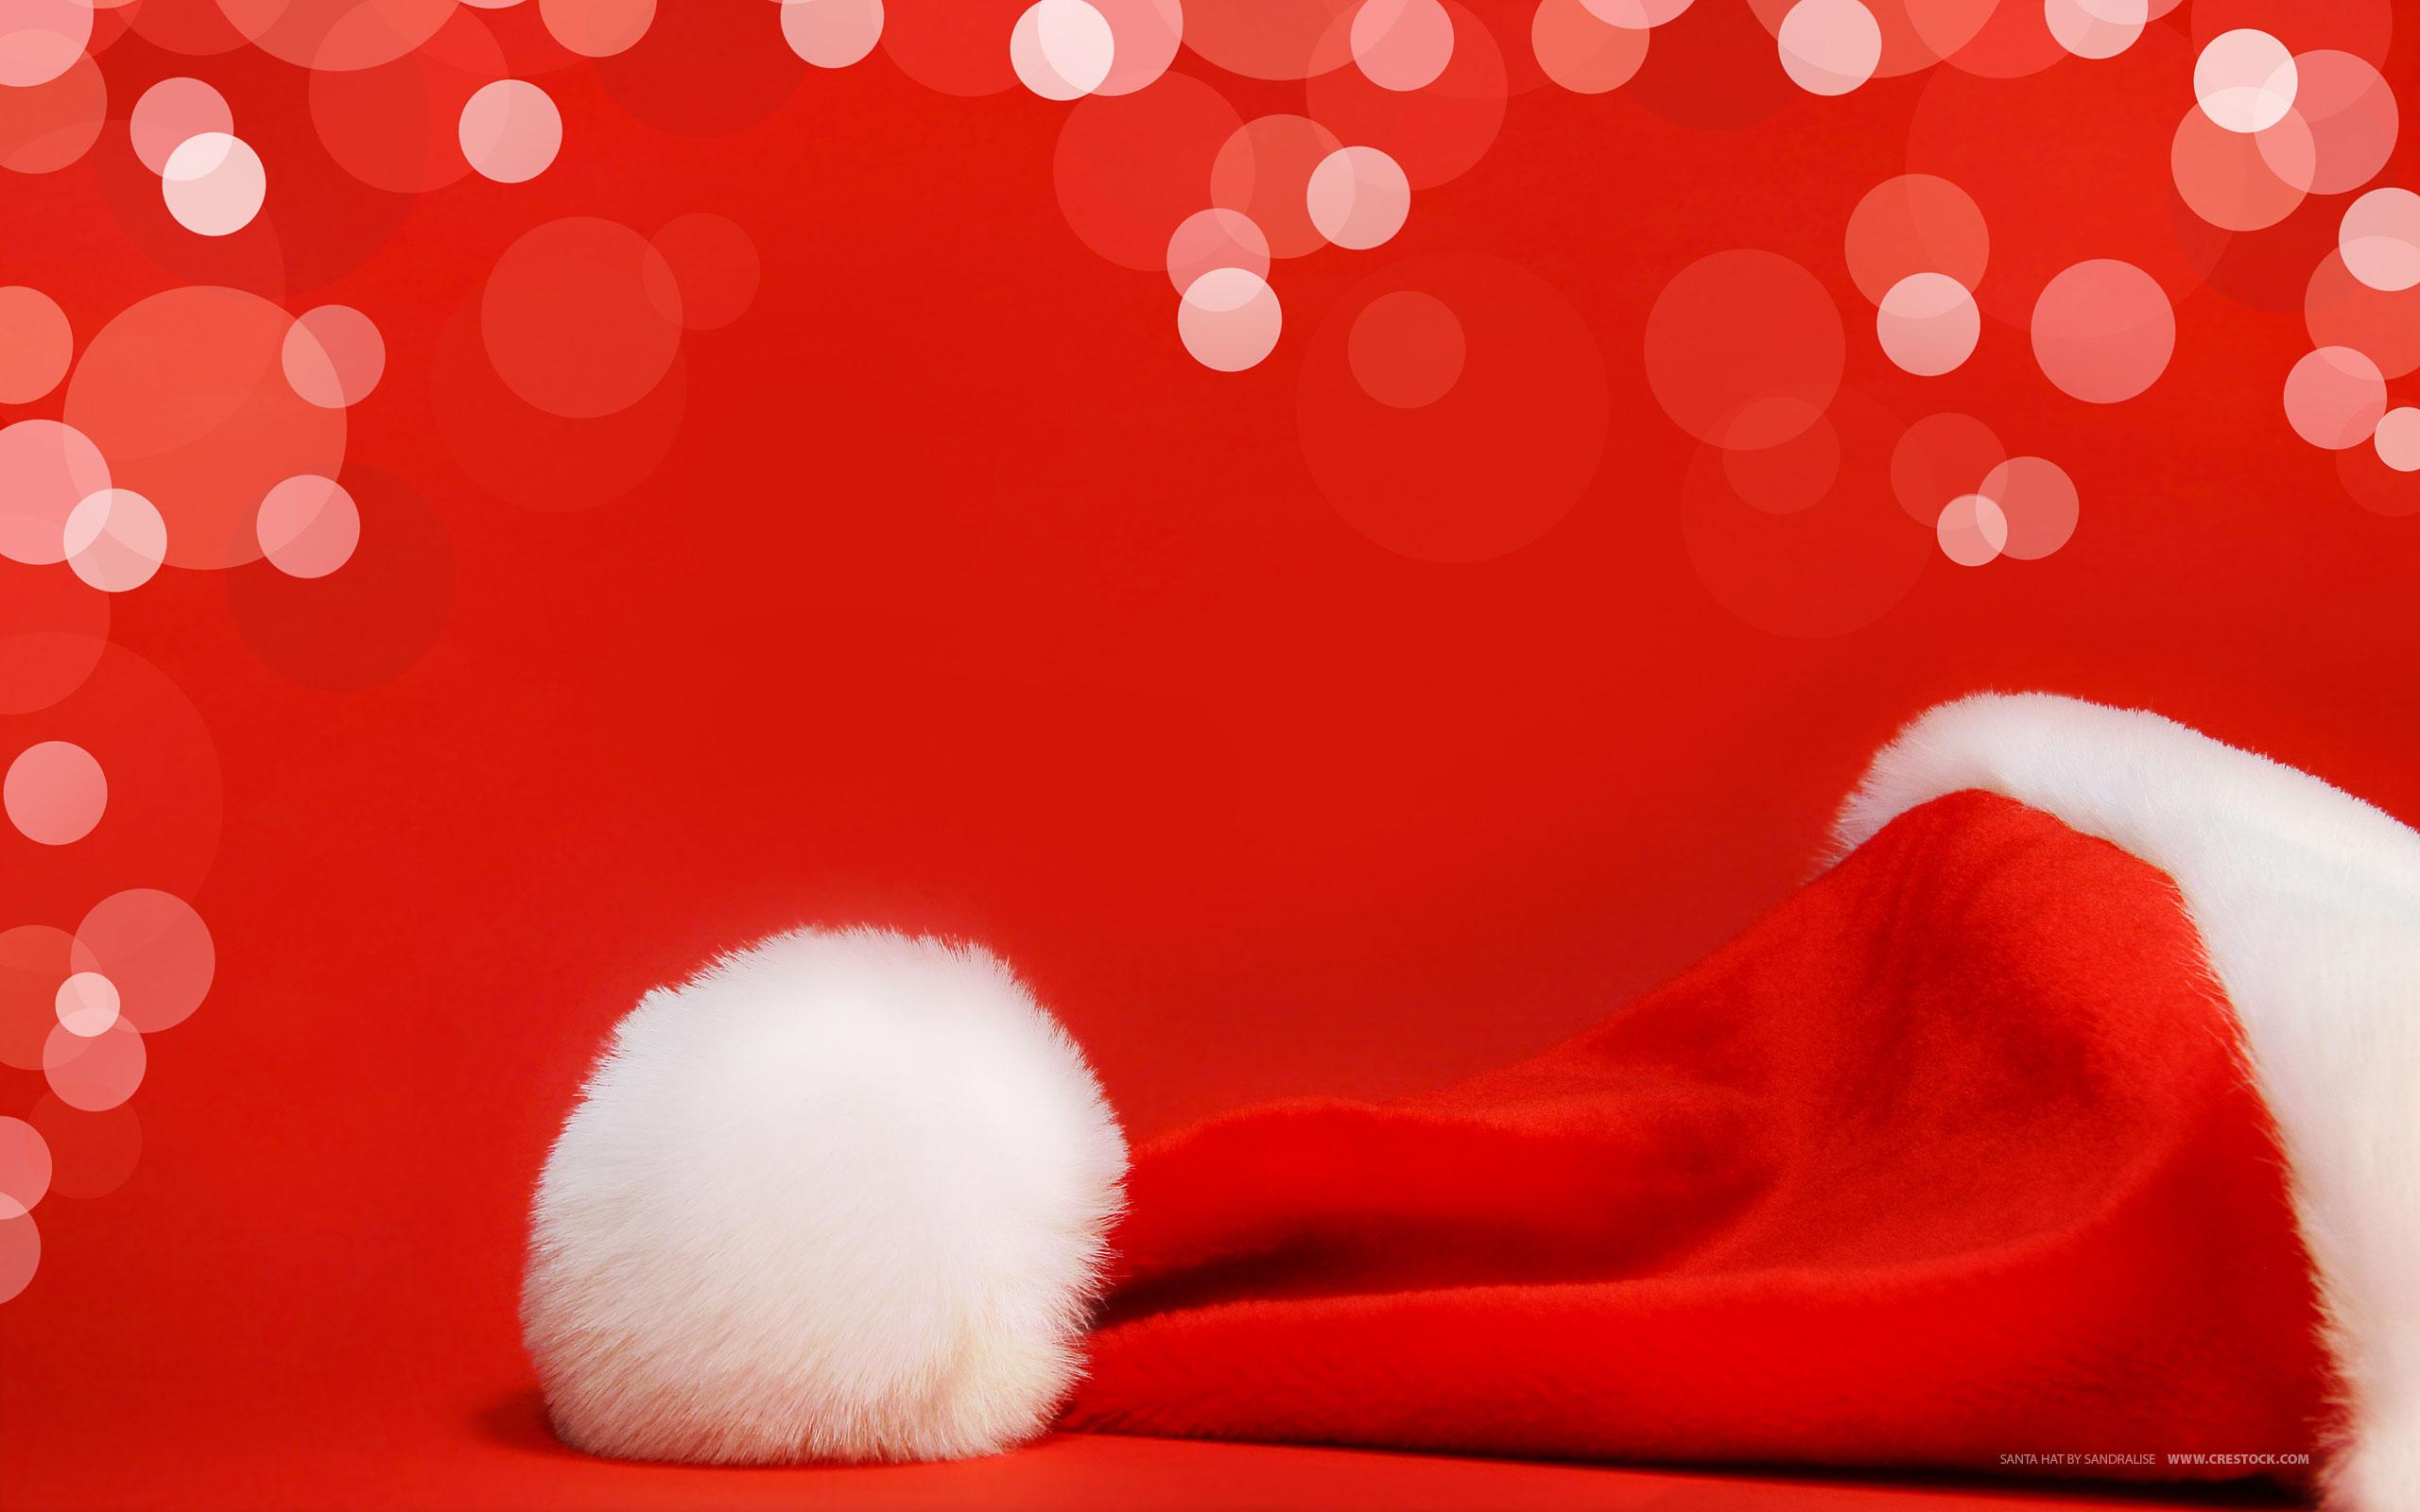 Santa Claus Wallpaper Android Phones